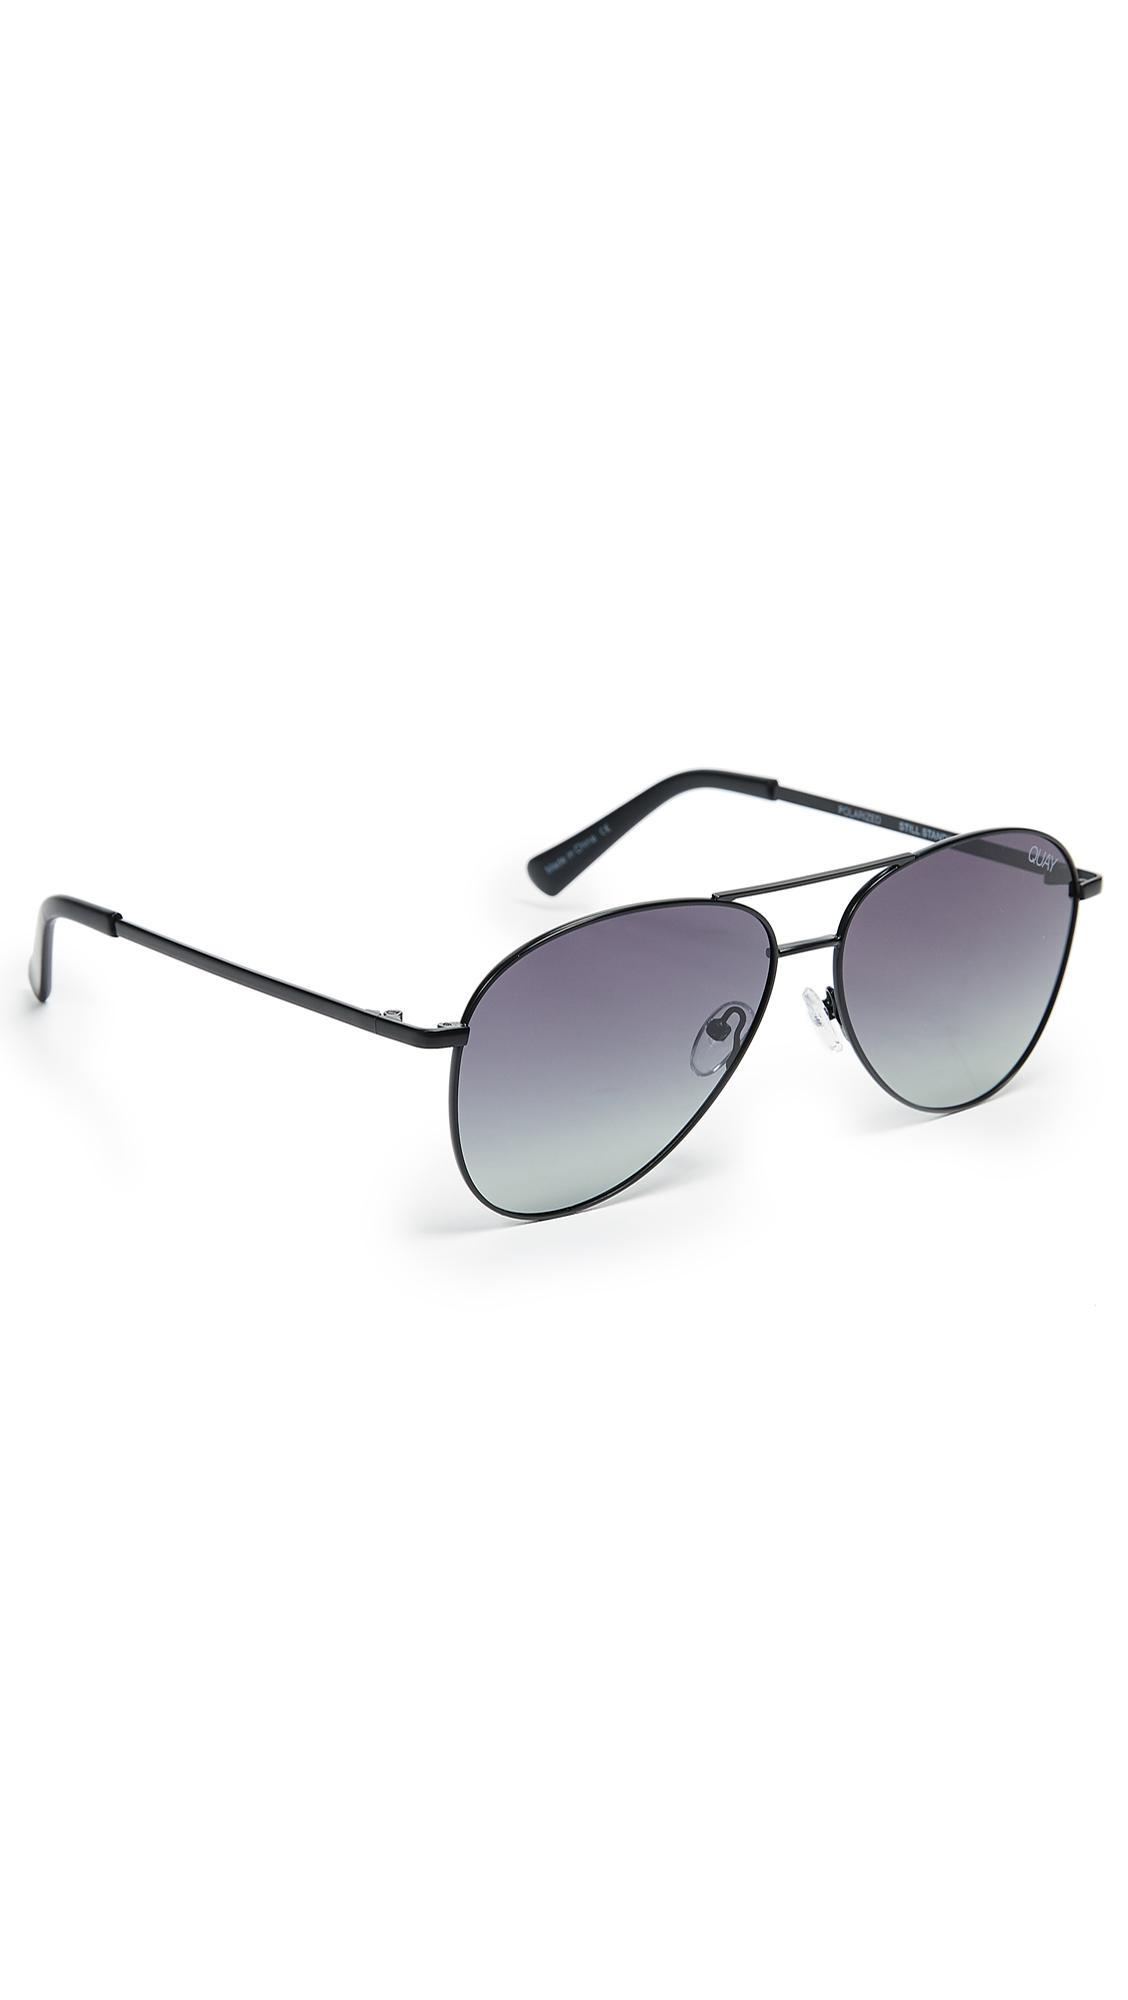 1c4311106e Lyst - Quay Still Standing Sunglasses in Black for Men